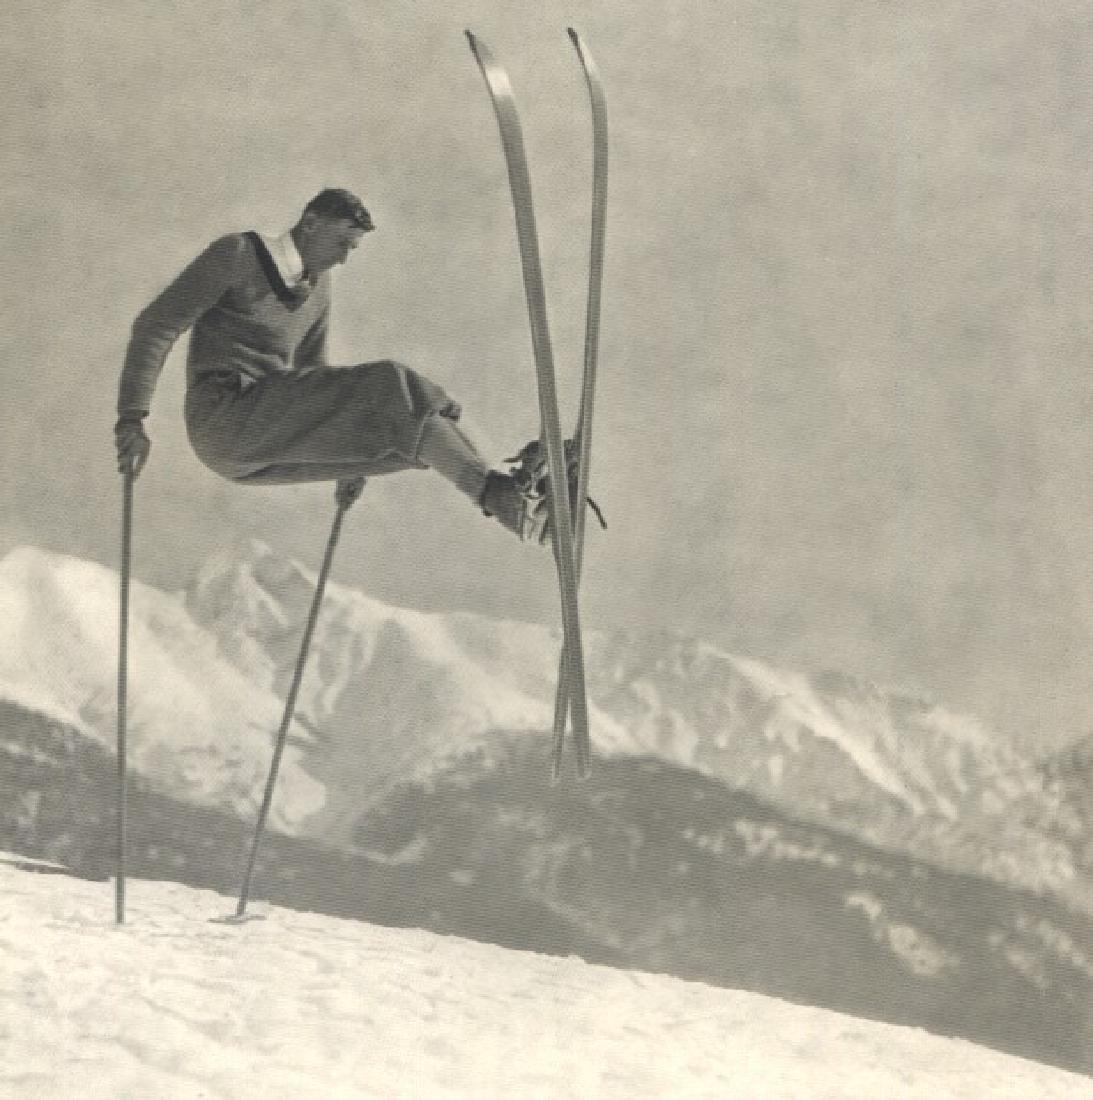 GERHARD RIEBICKE- Skier